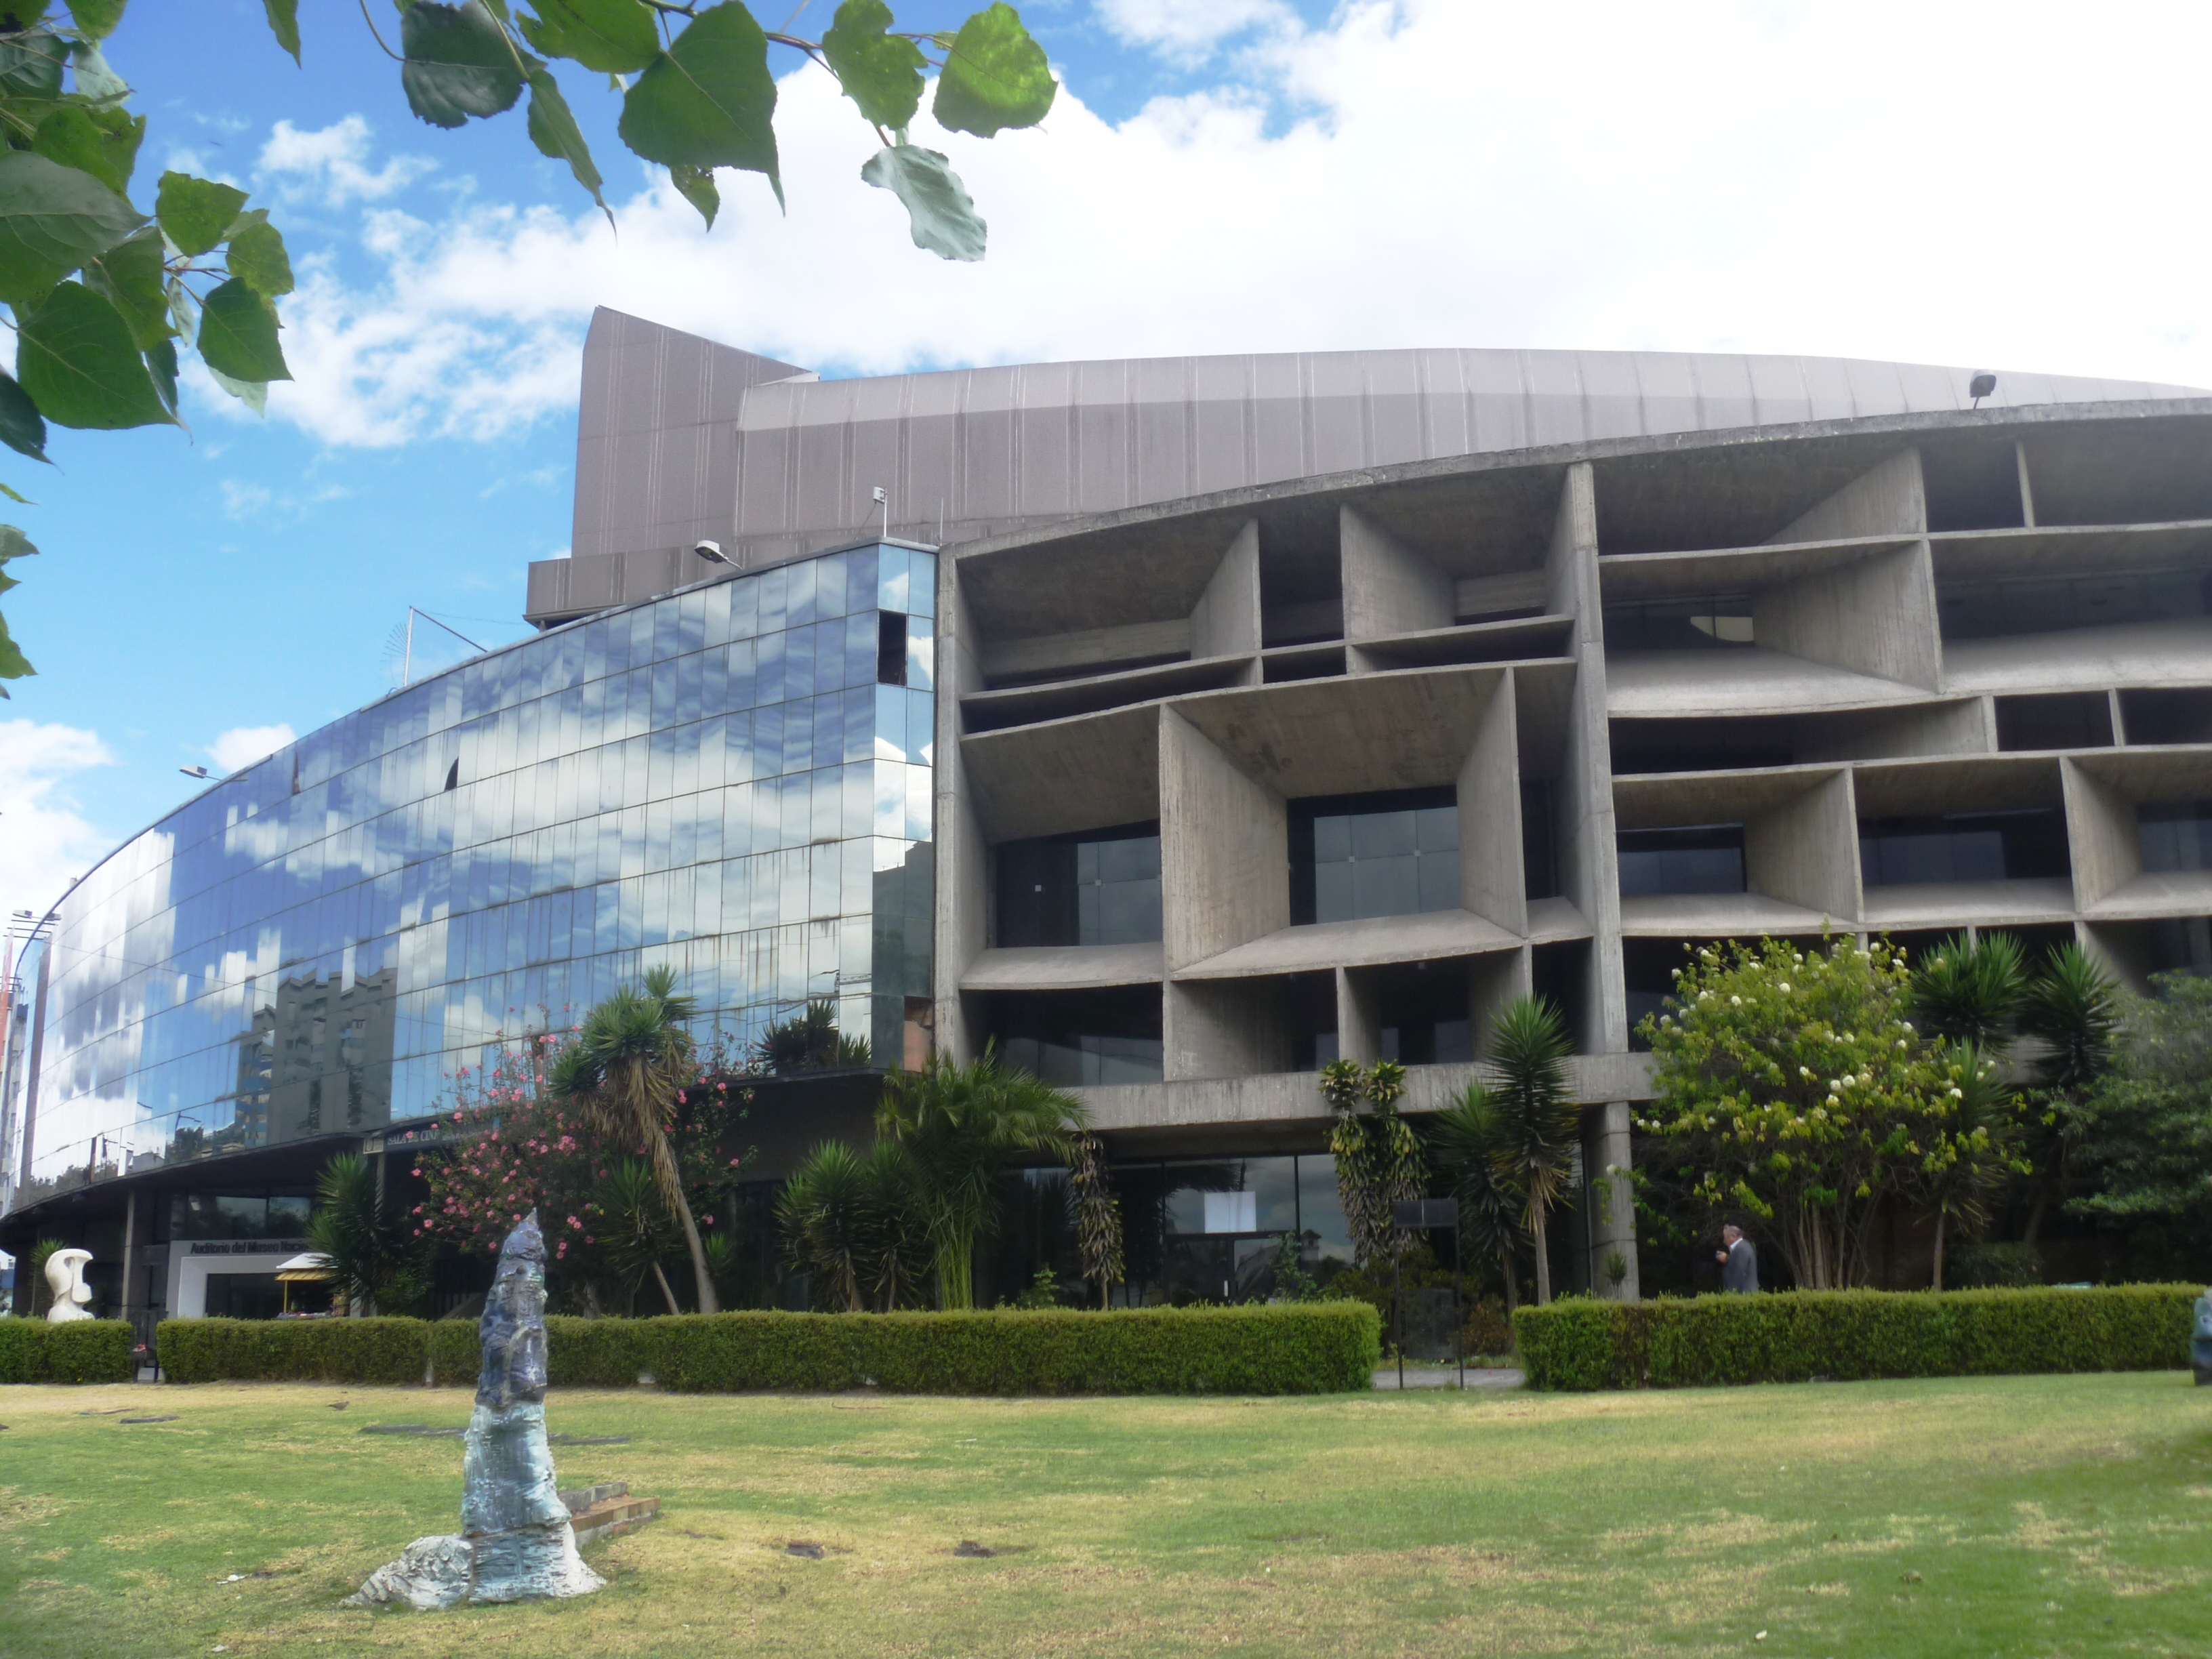 Museo Nacional del Ecuador - Wikipedia, la enciclopedia libre